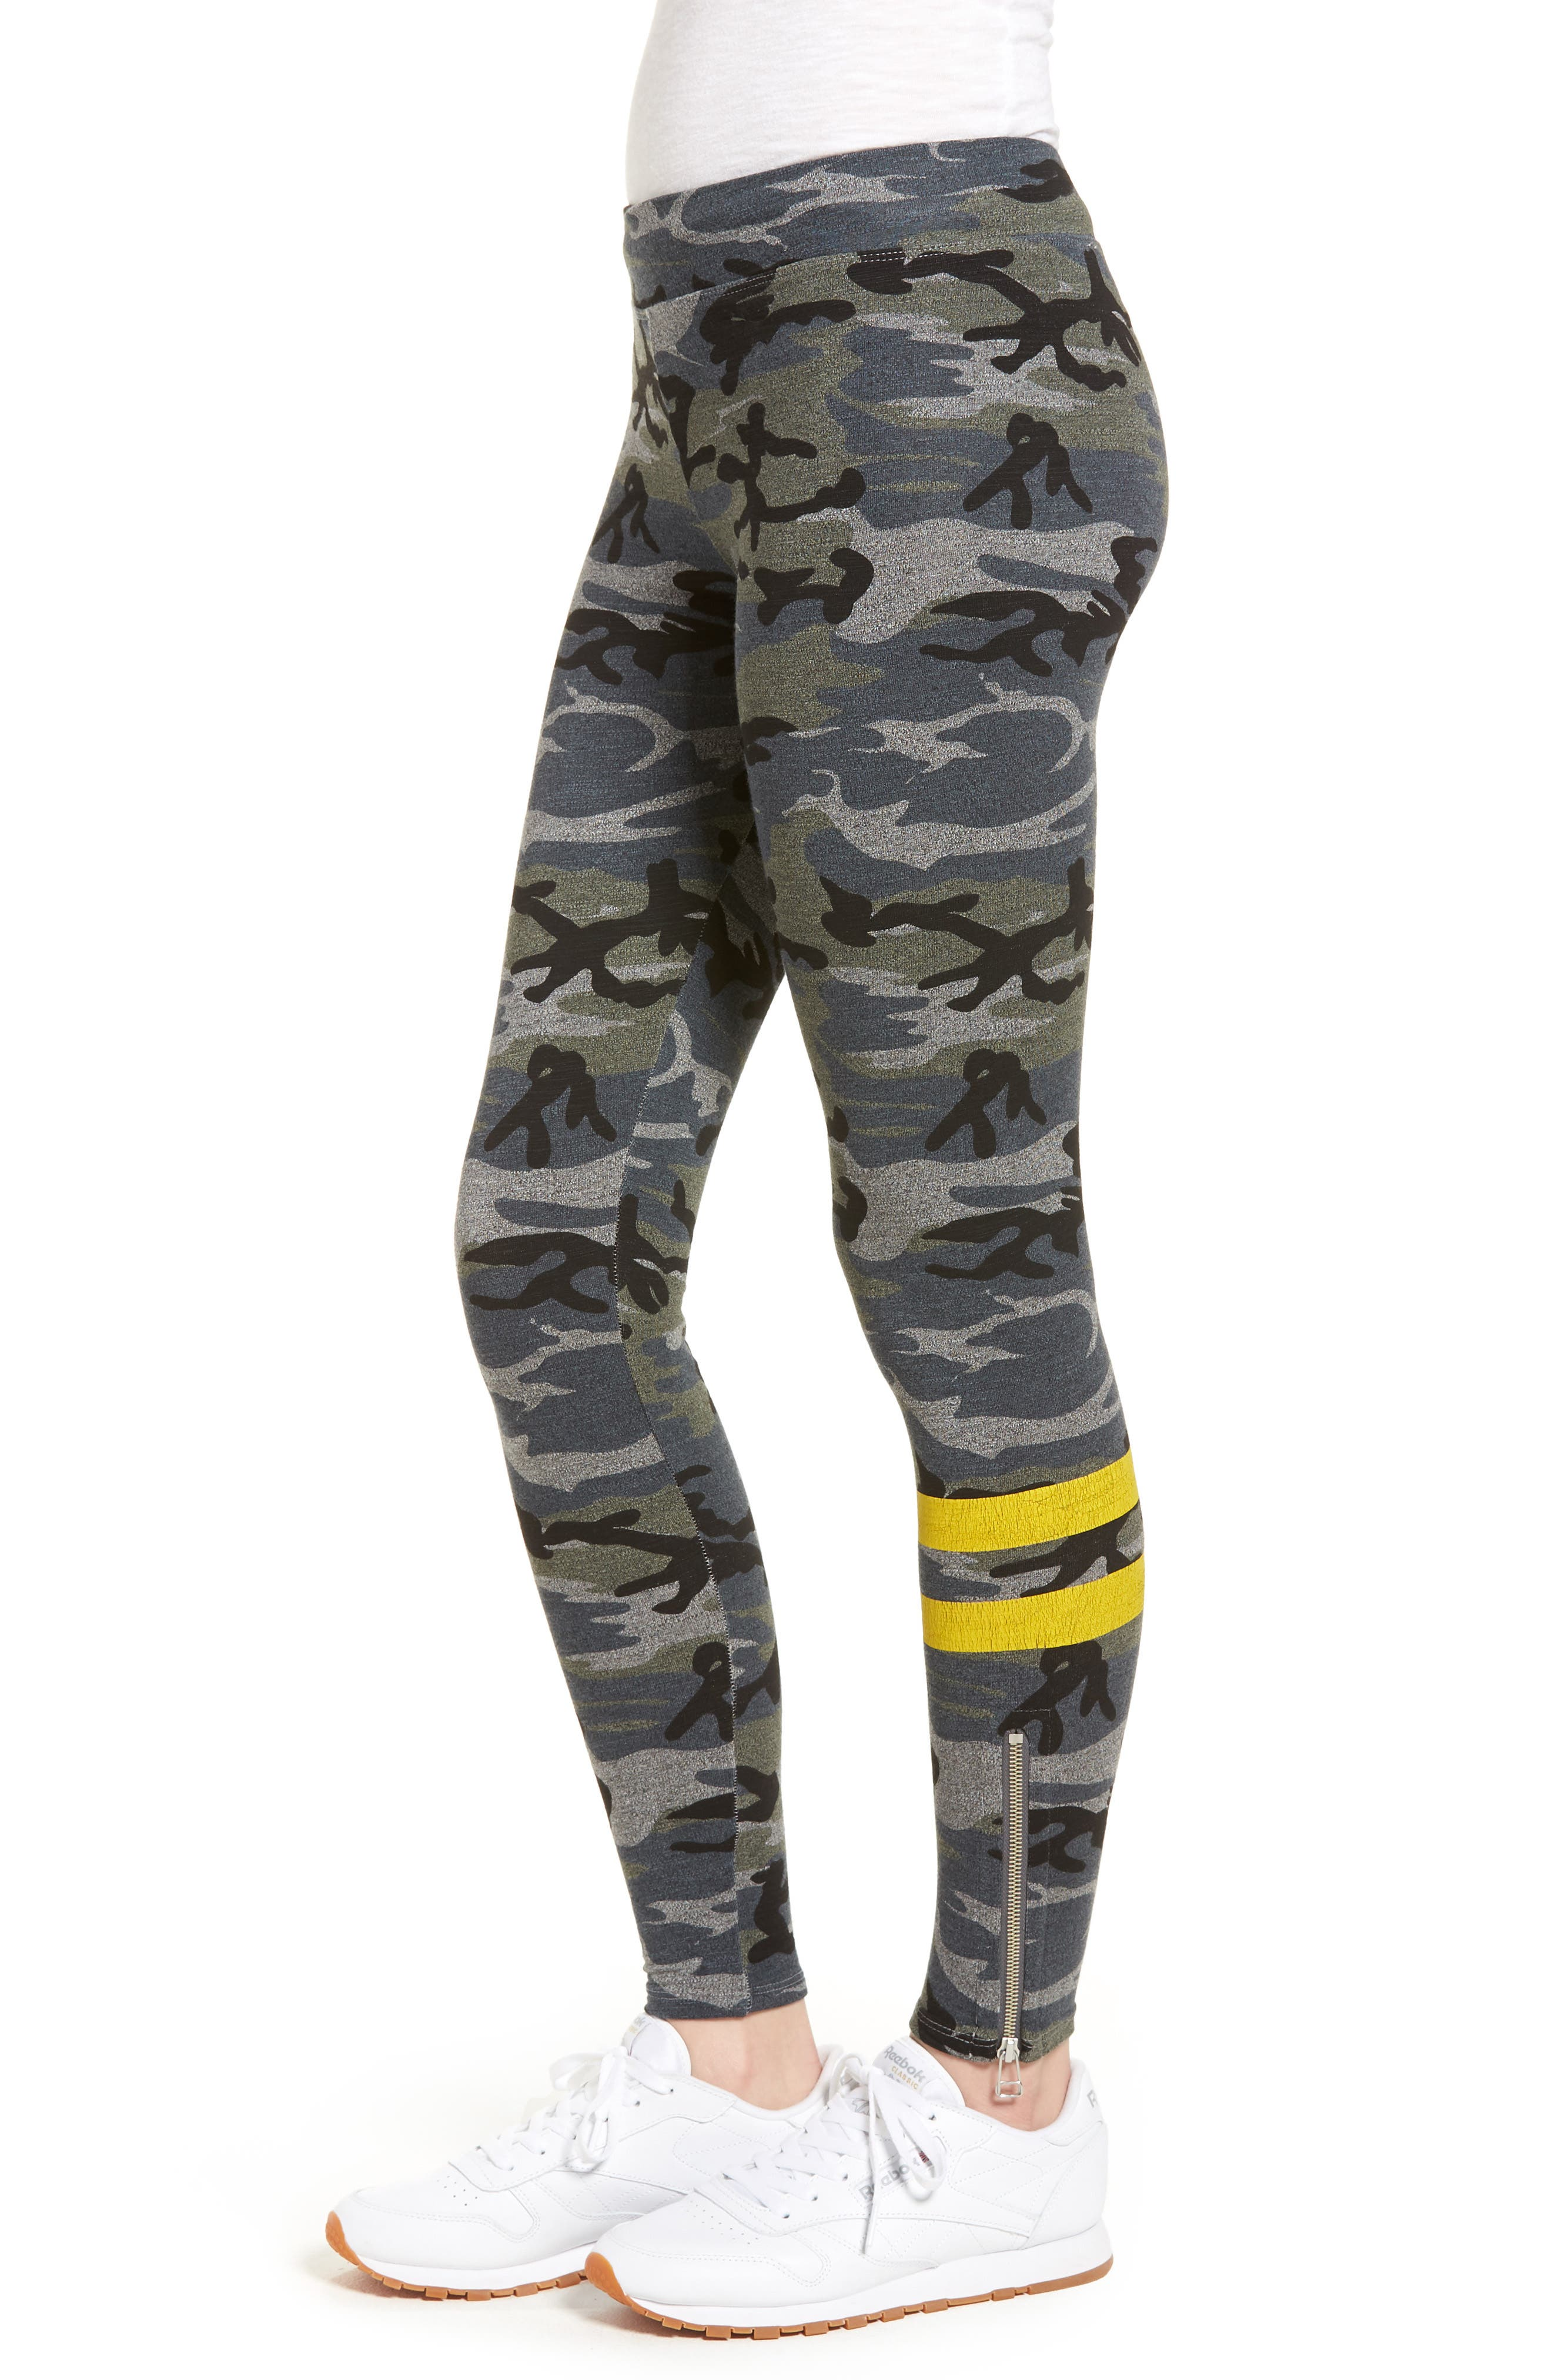 Stripe Camo Yoga Pants,                             Alternate thumbnail 3, color,                             020